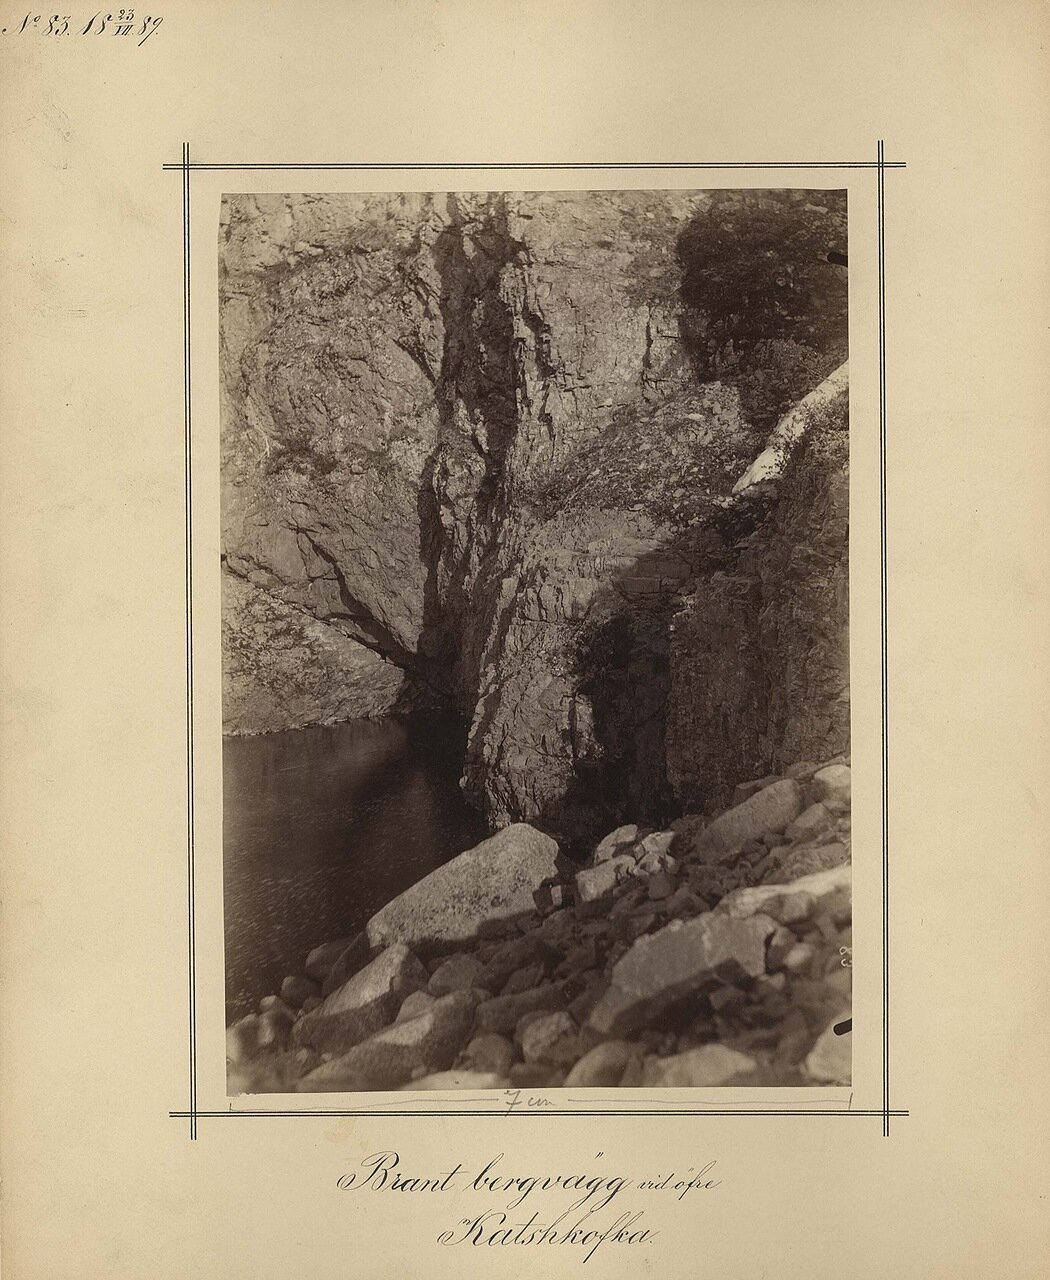 23.7.1889. Крутая скала на реке Кофта